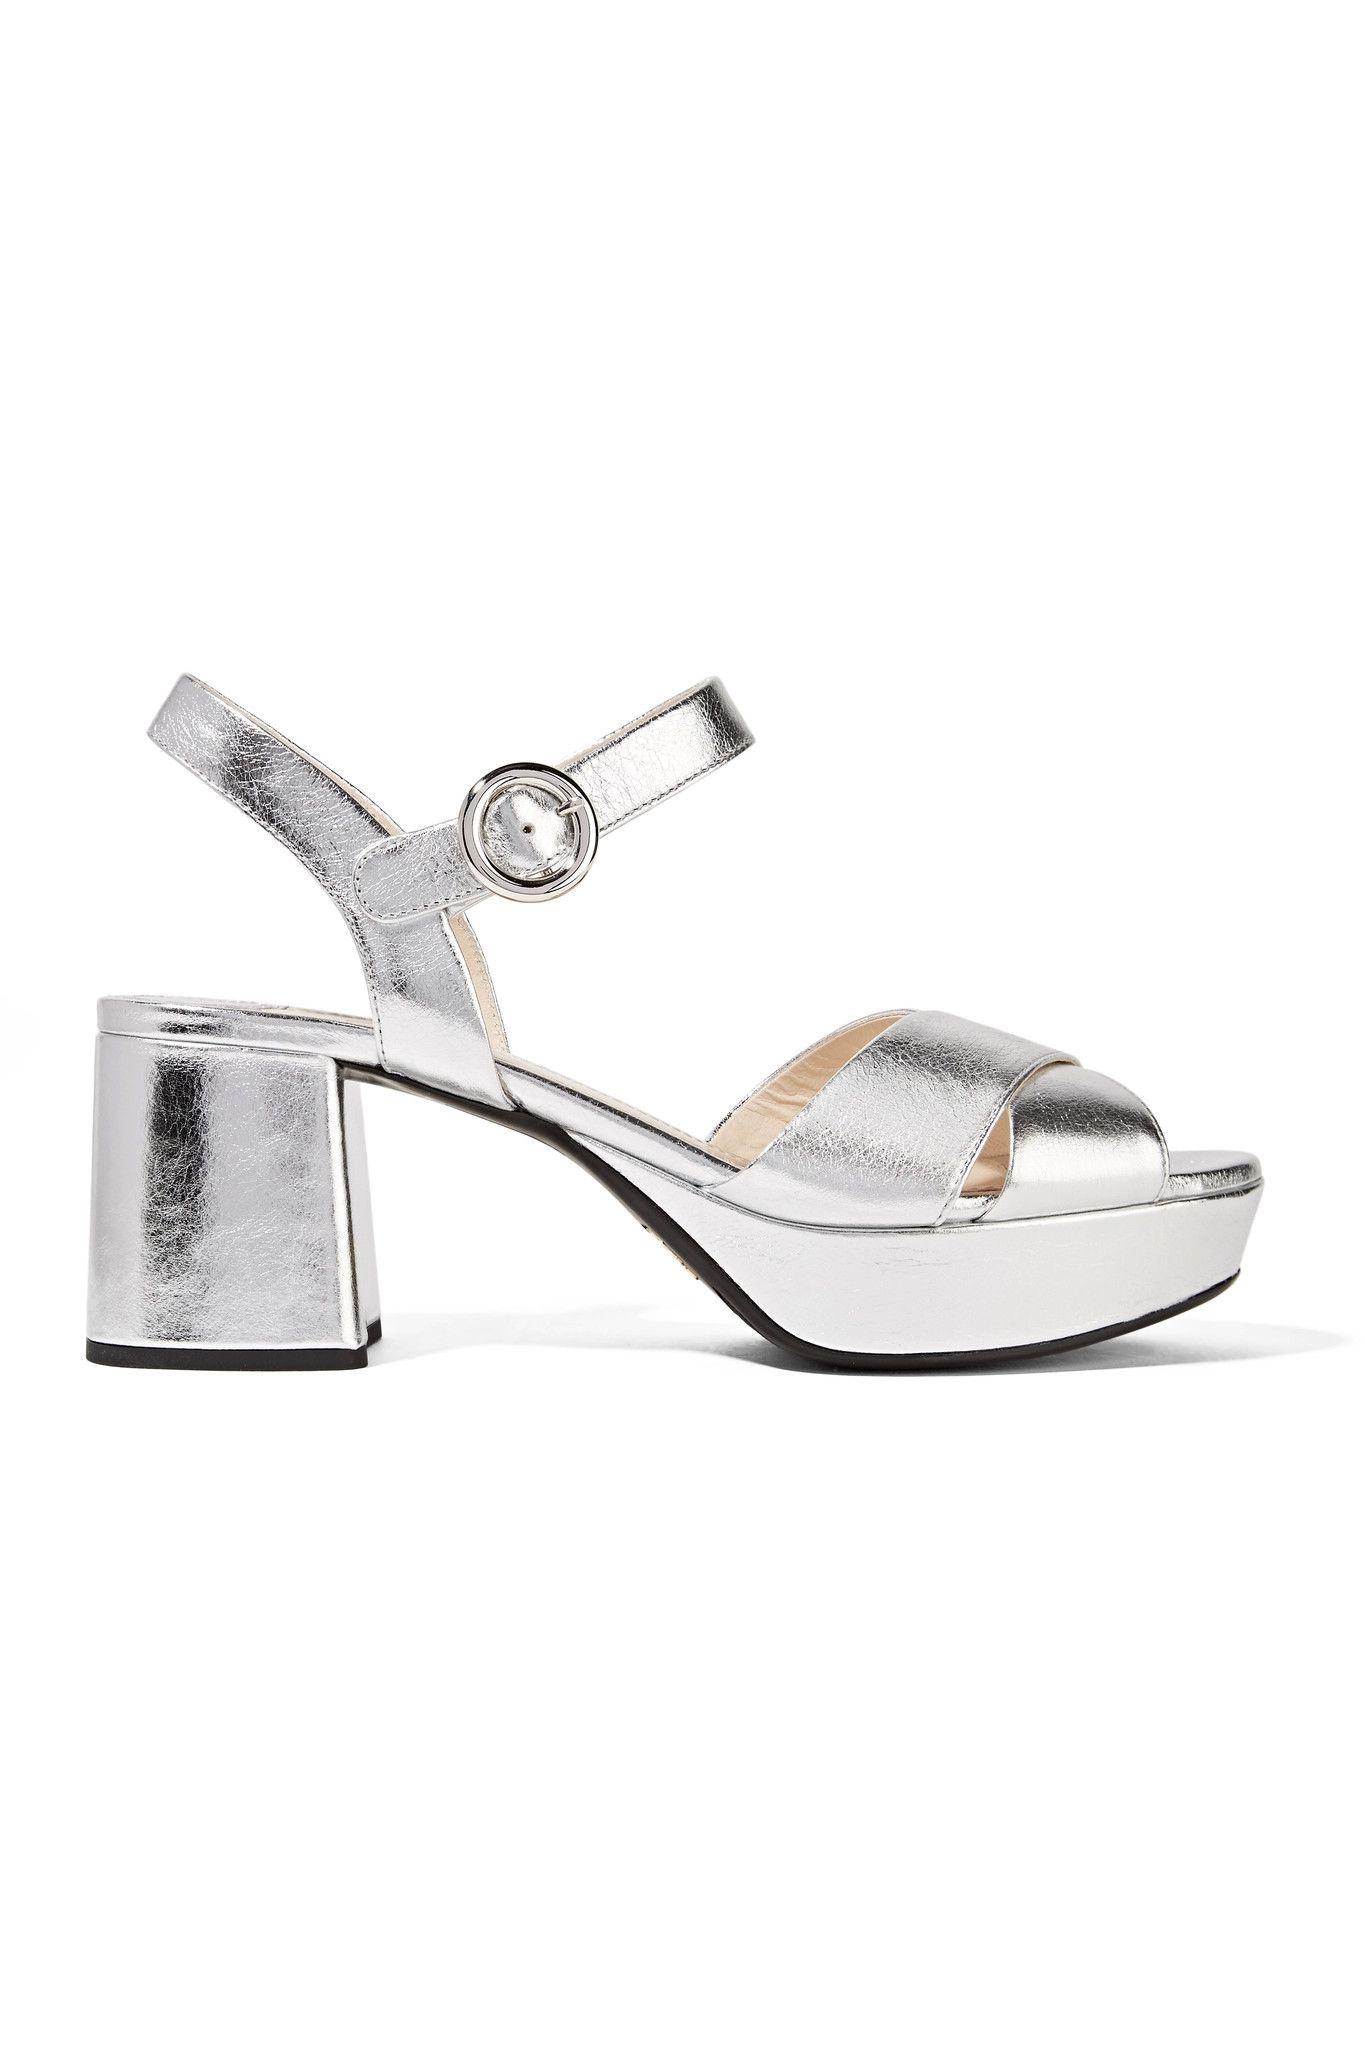 64f04b89882 PRADA Metallic leather platform sandals  685.00 https   www.net-a ...